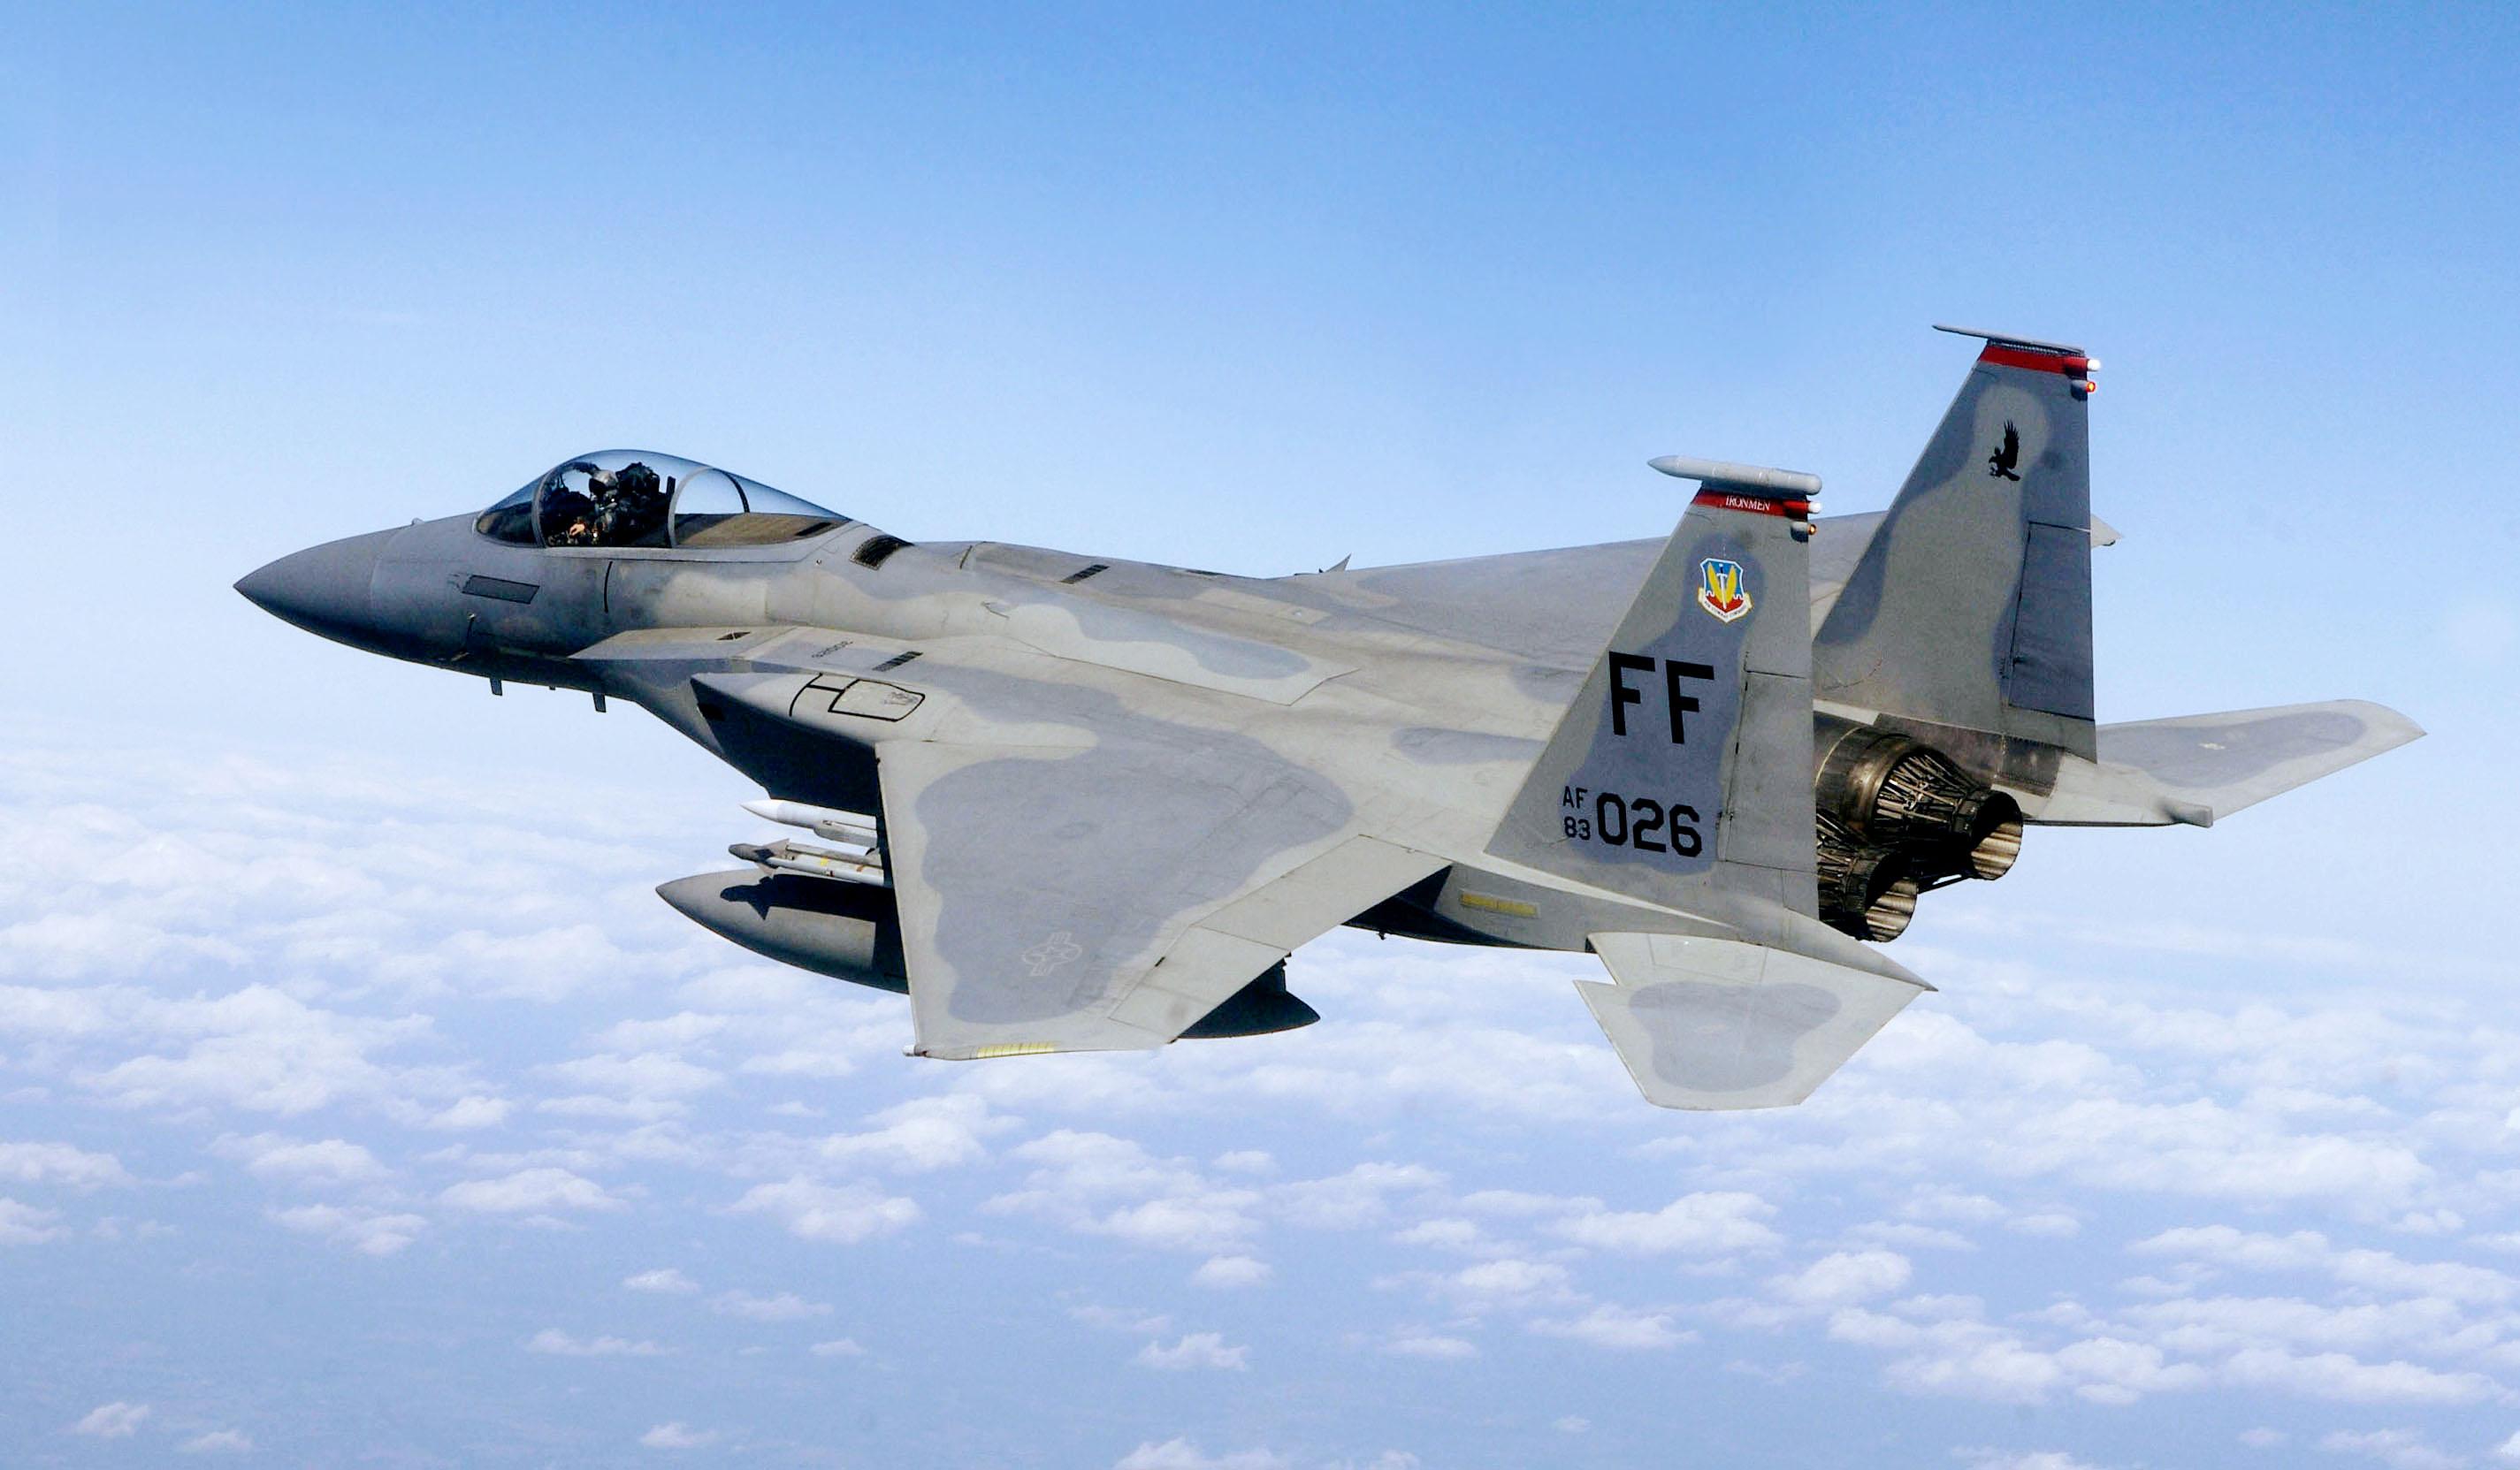 Depiction of McDonnell Douglas F-15 Eagle